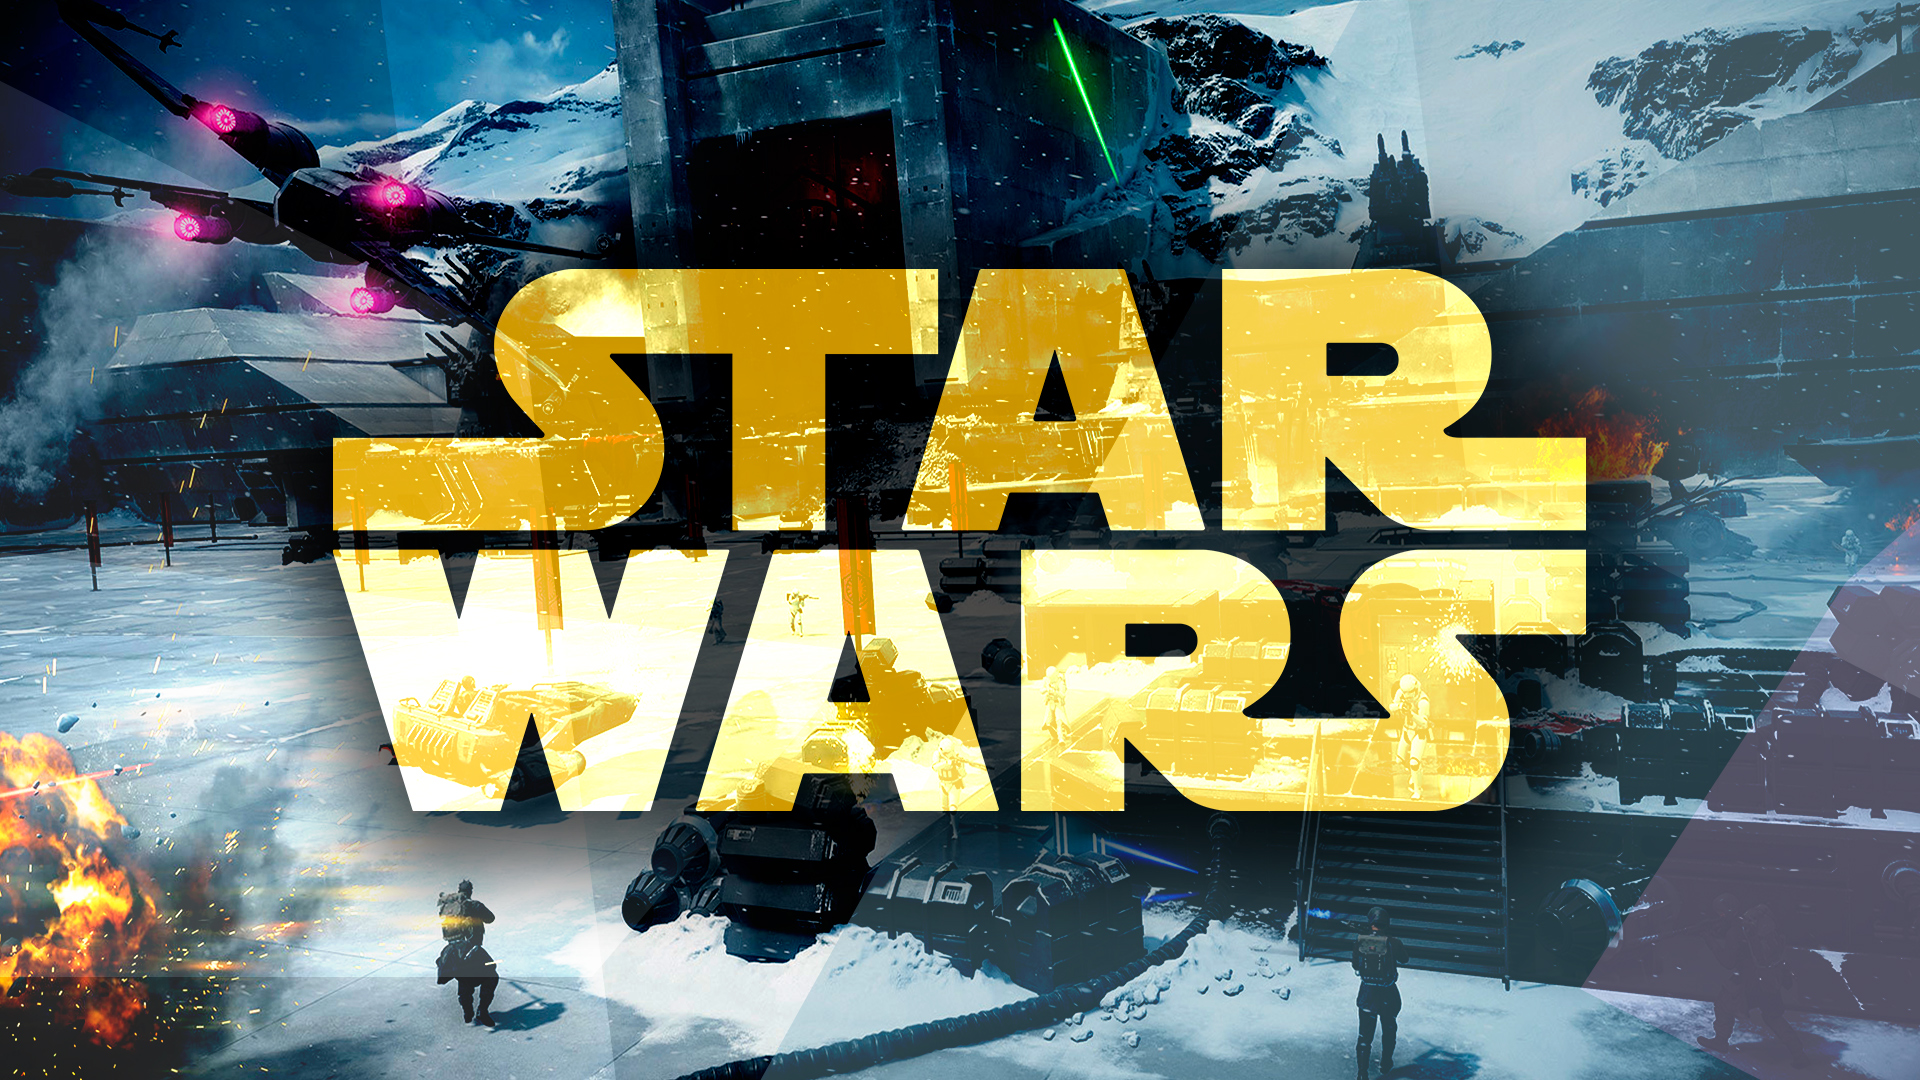 Star Wars, Star Wars: Battlefront, A Star Wars Story, Jedi, Stormtrooper, Trooper